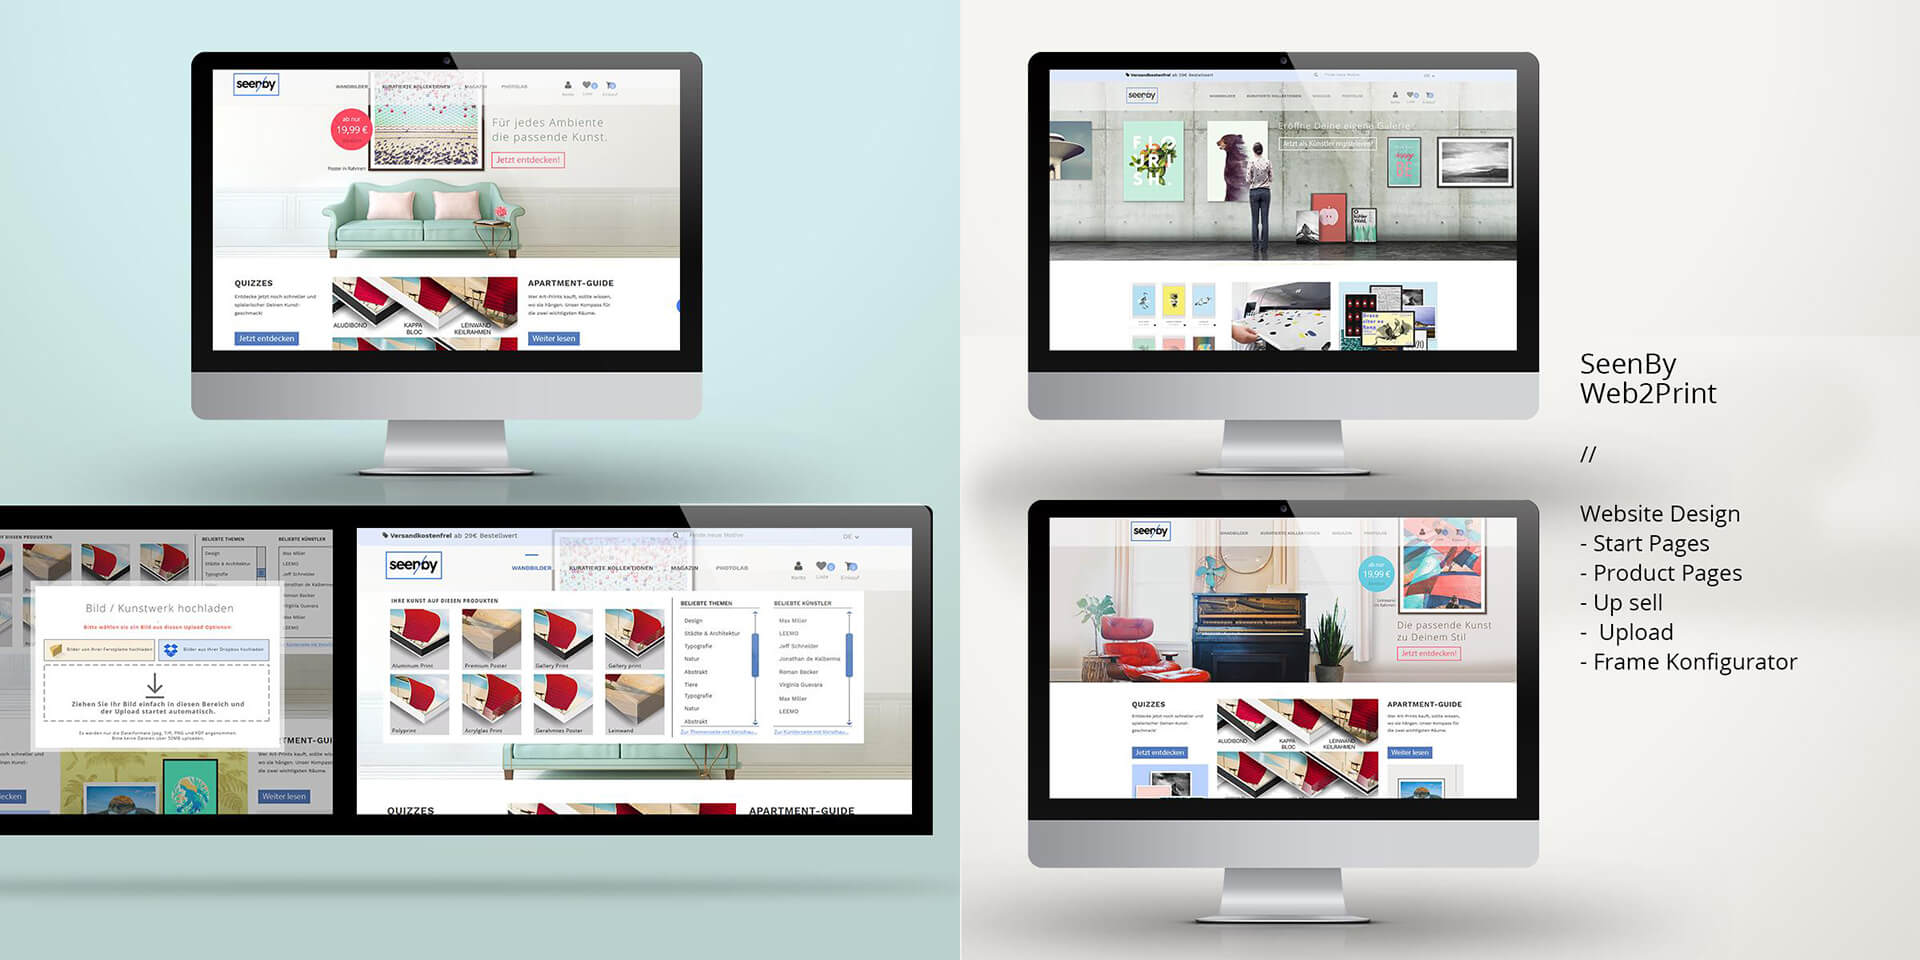 webtoprint wordpress social media marketing html5 css newsletter responsive banner 014